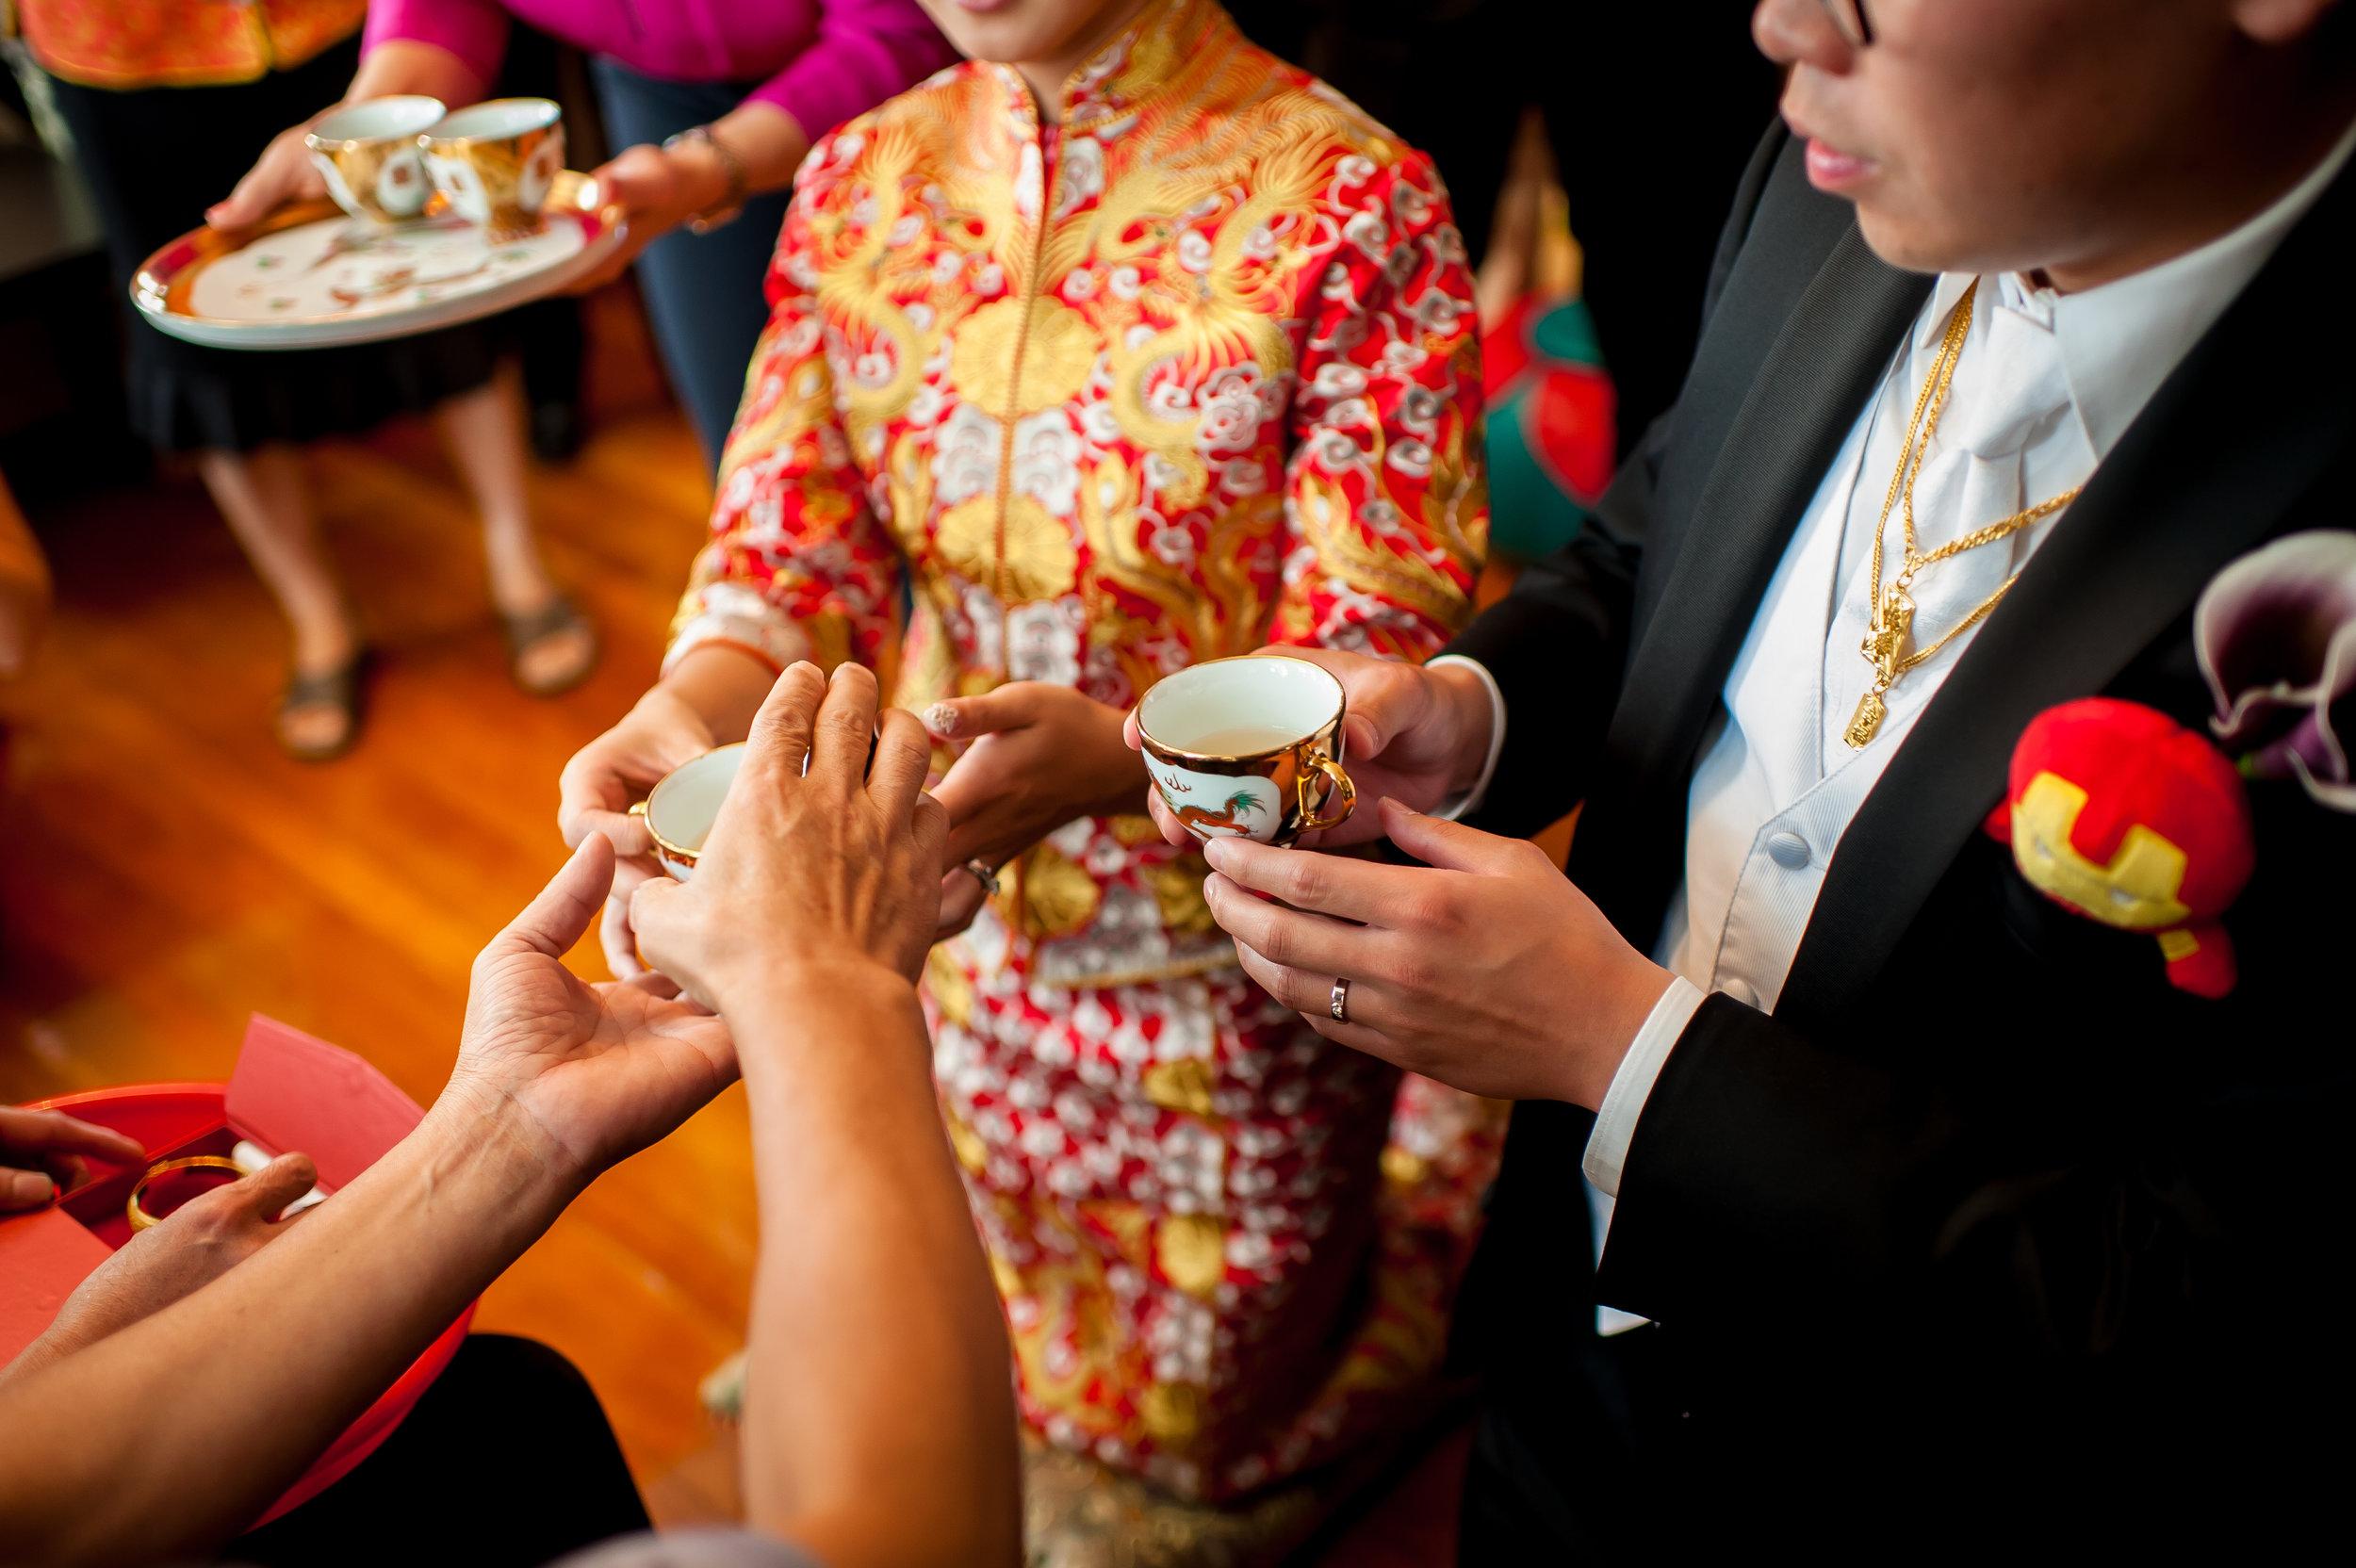 Amy-Ken-006-Chinese-Tea-wedding-ceremony-boston-massachusetts-promessa-studios-karen-eng.jpg